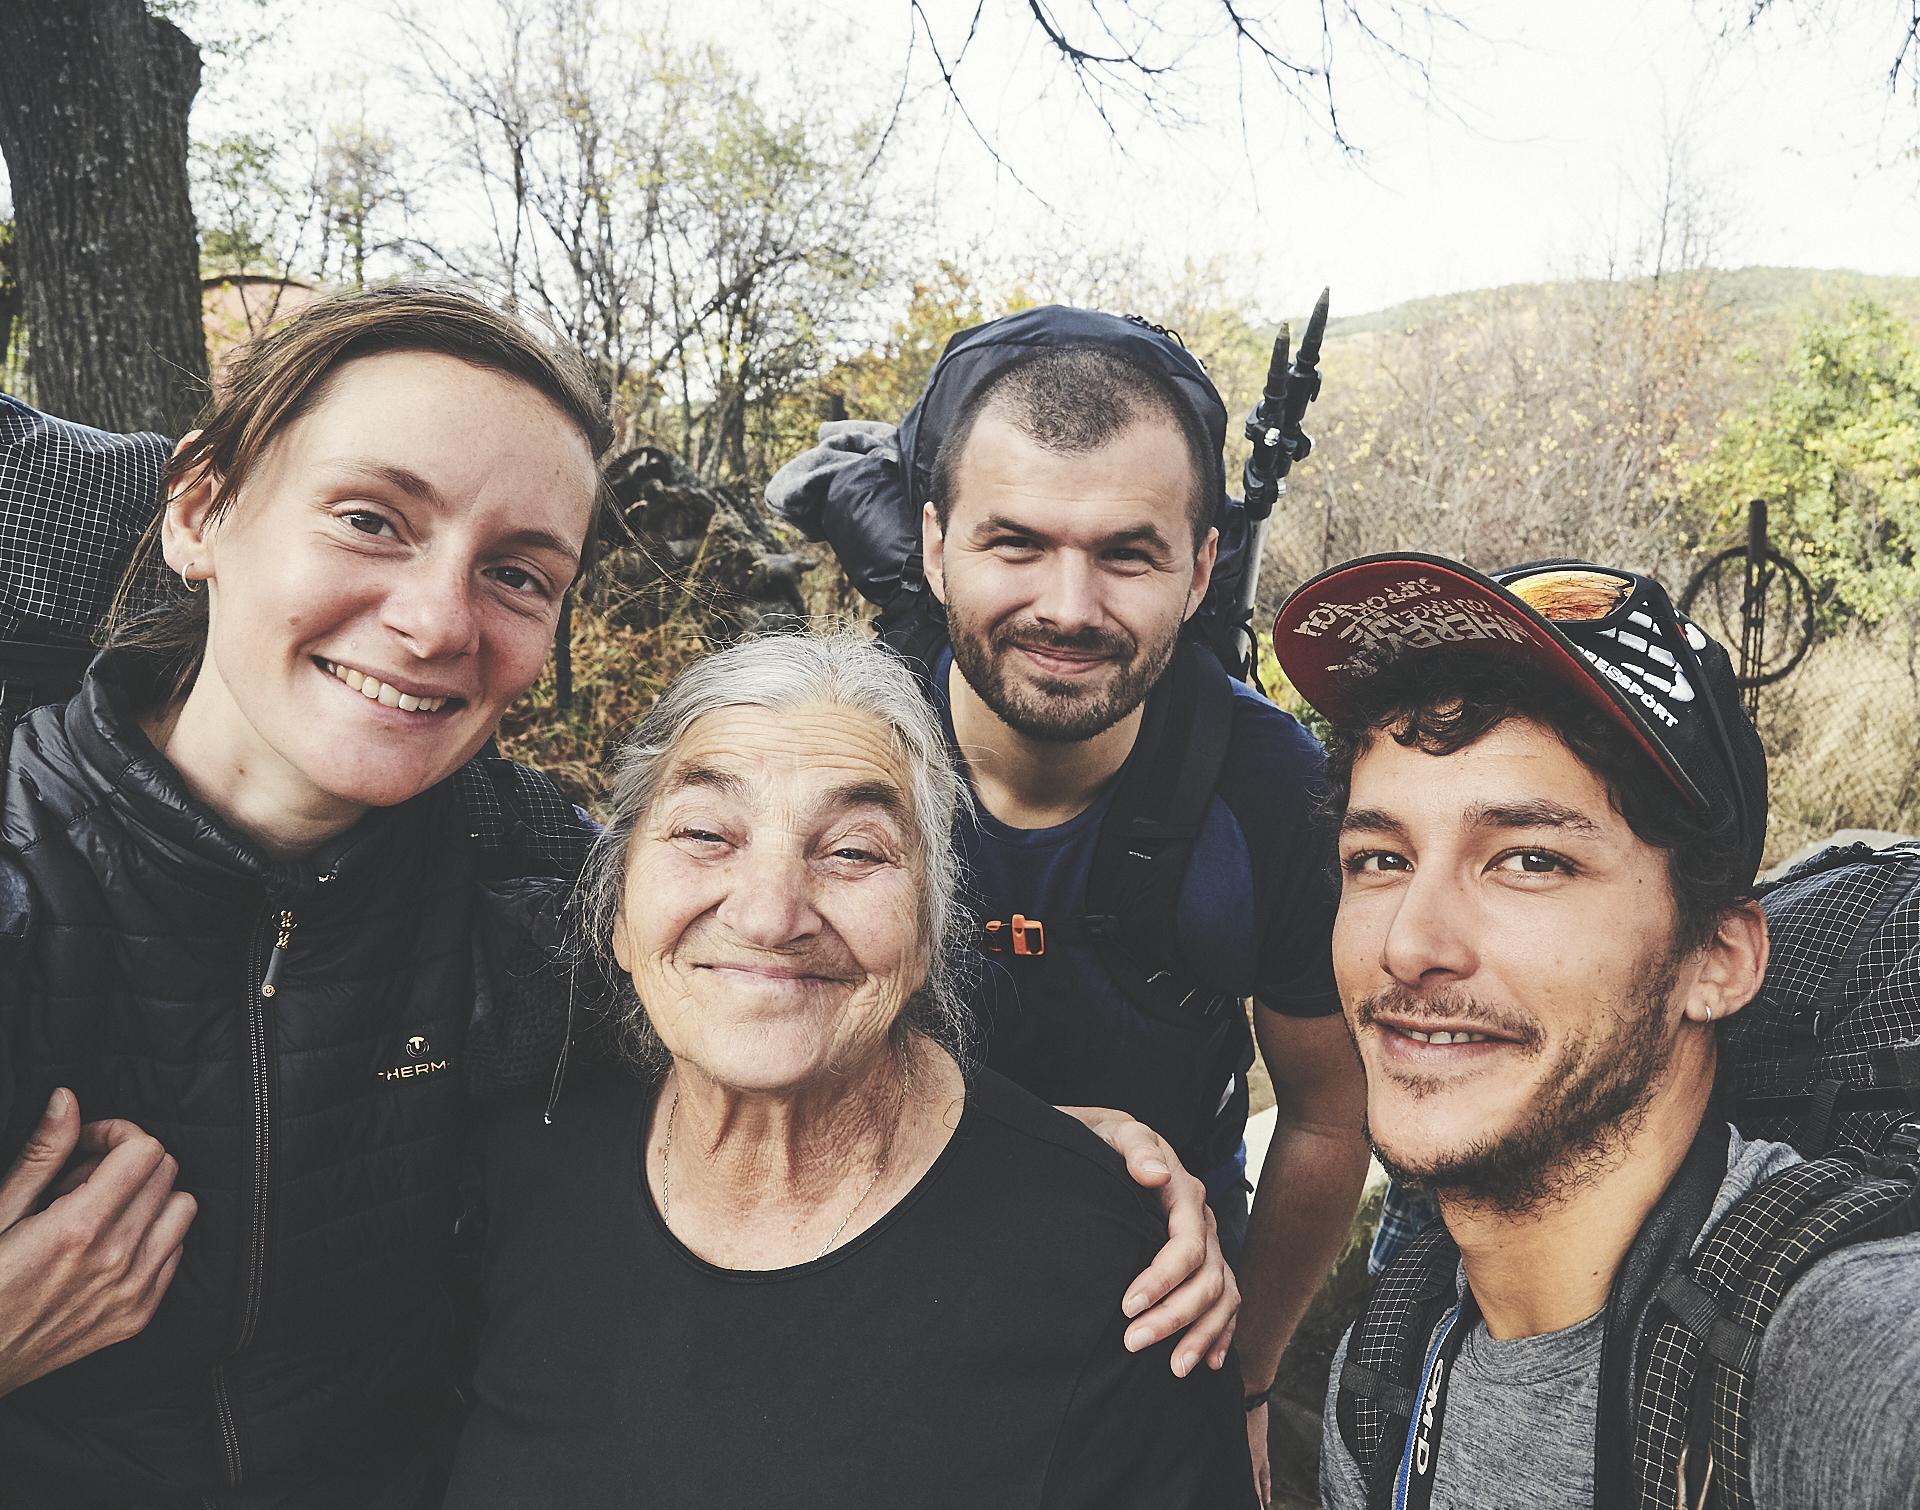 2PVA - Bulgaria- 0437 - nov. 06 2019